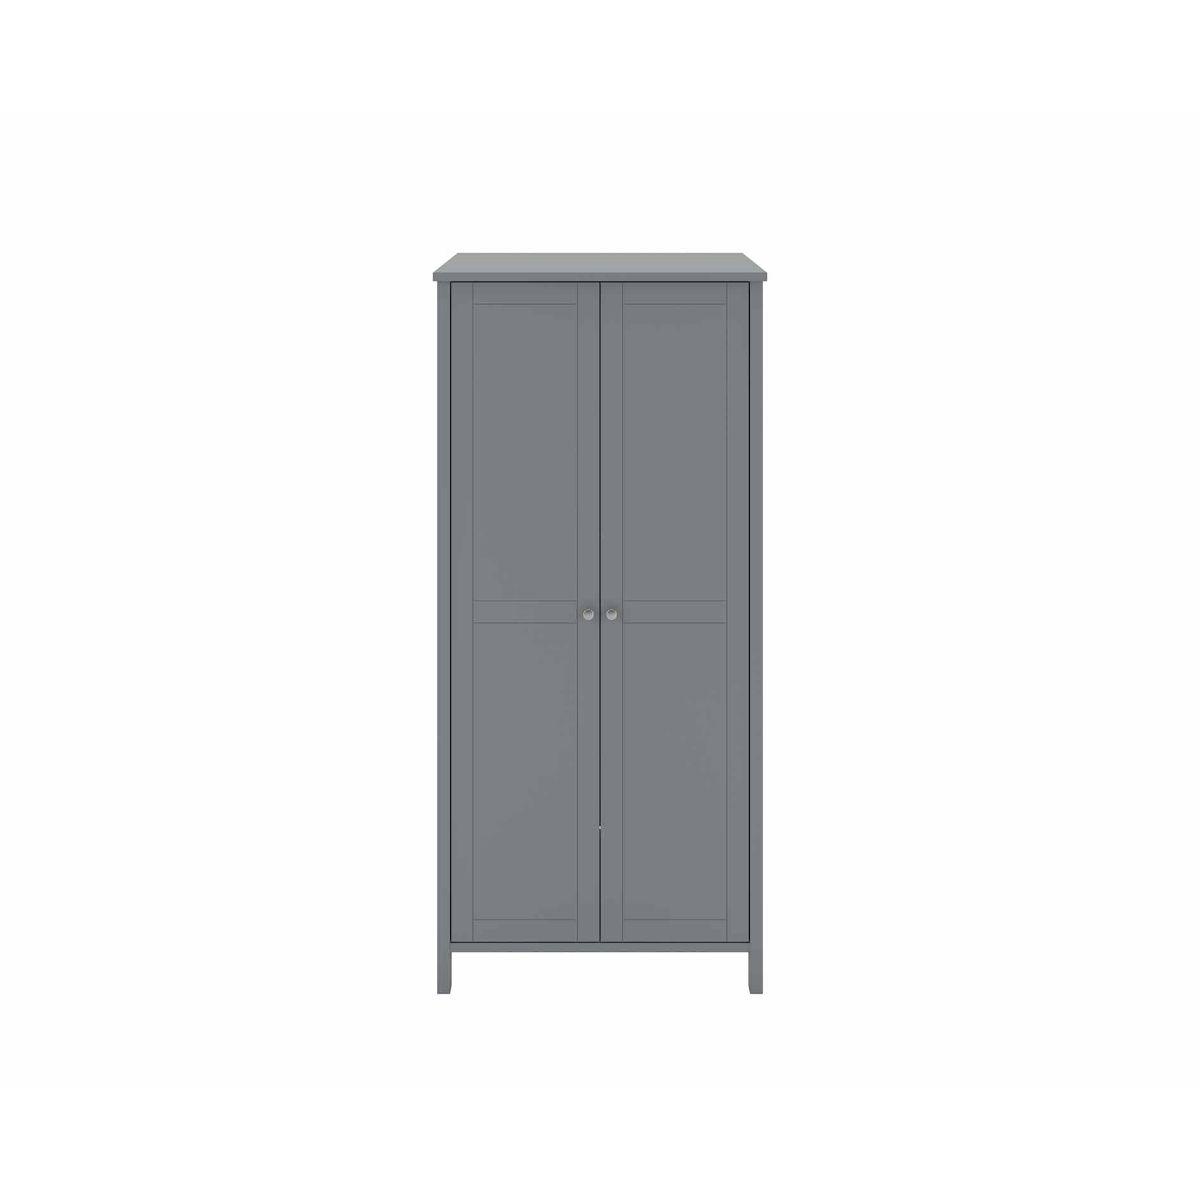 Steens Tromso 2 Door Wardrobe, Grey